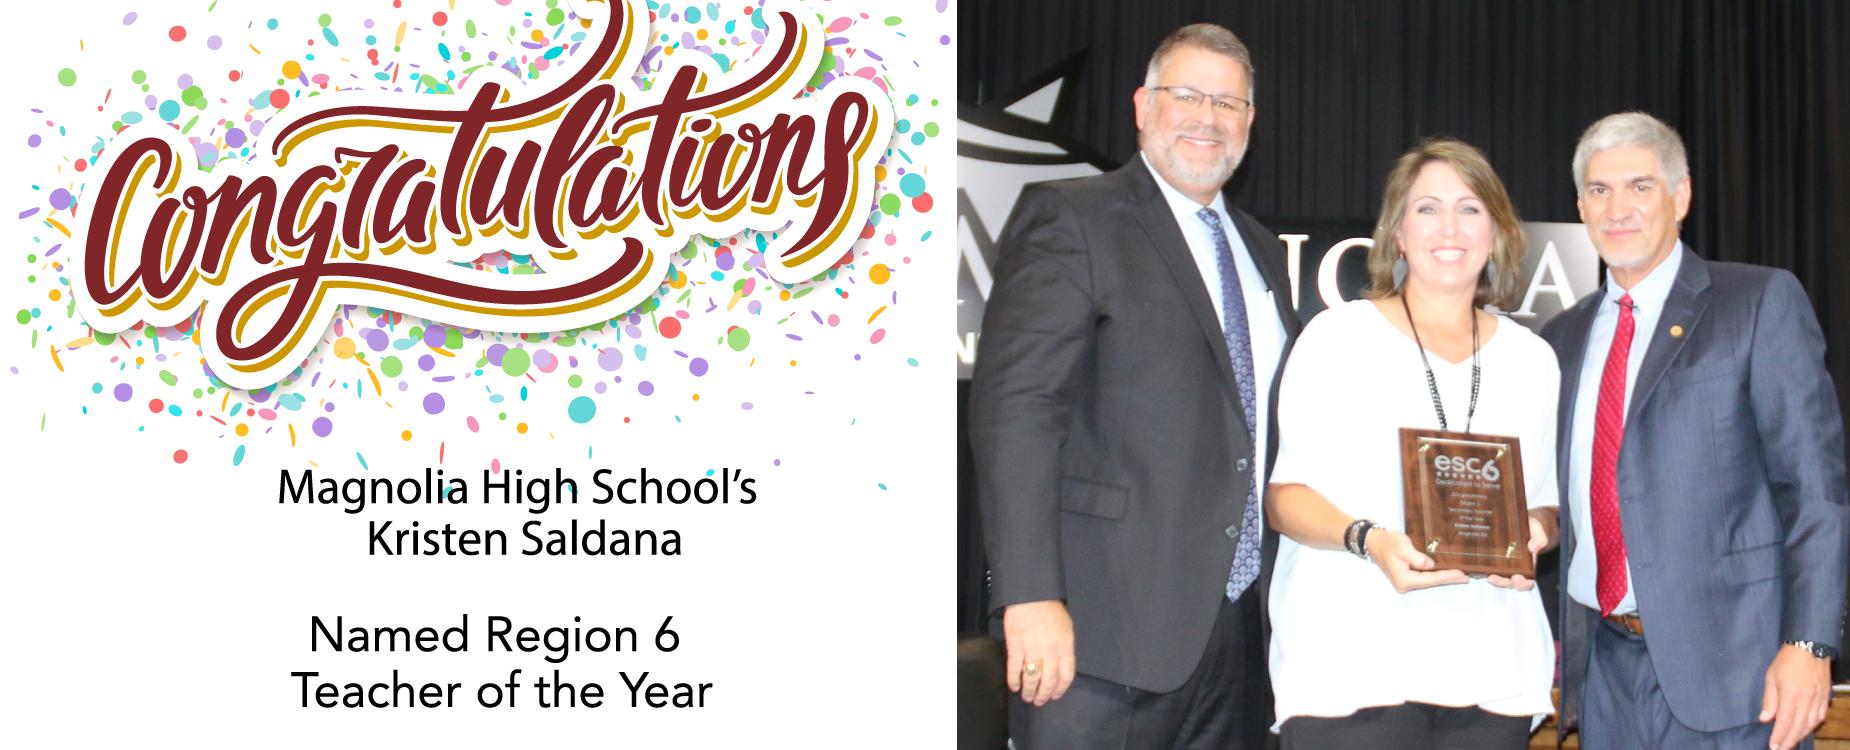 Magnolia High School English teacher Kristen Saldana has been named the Region 6 Teacher of the Year.